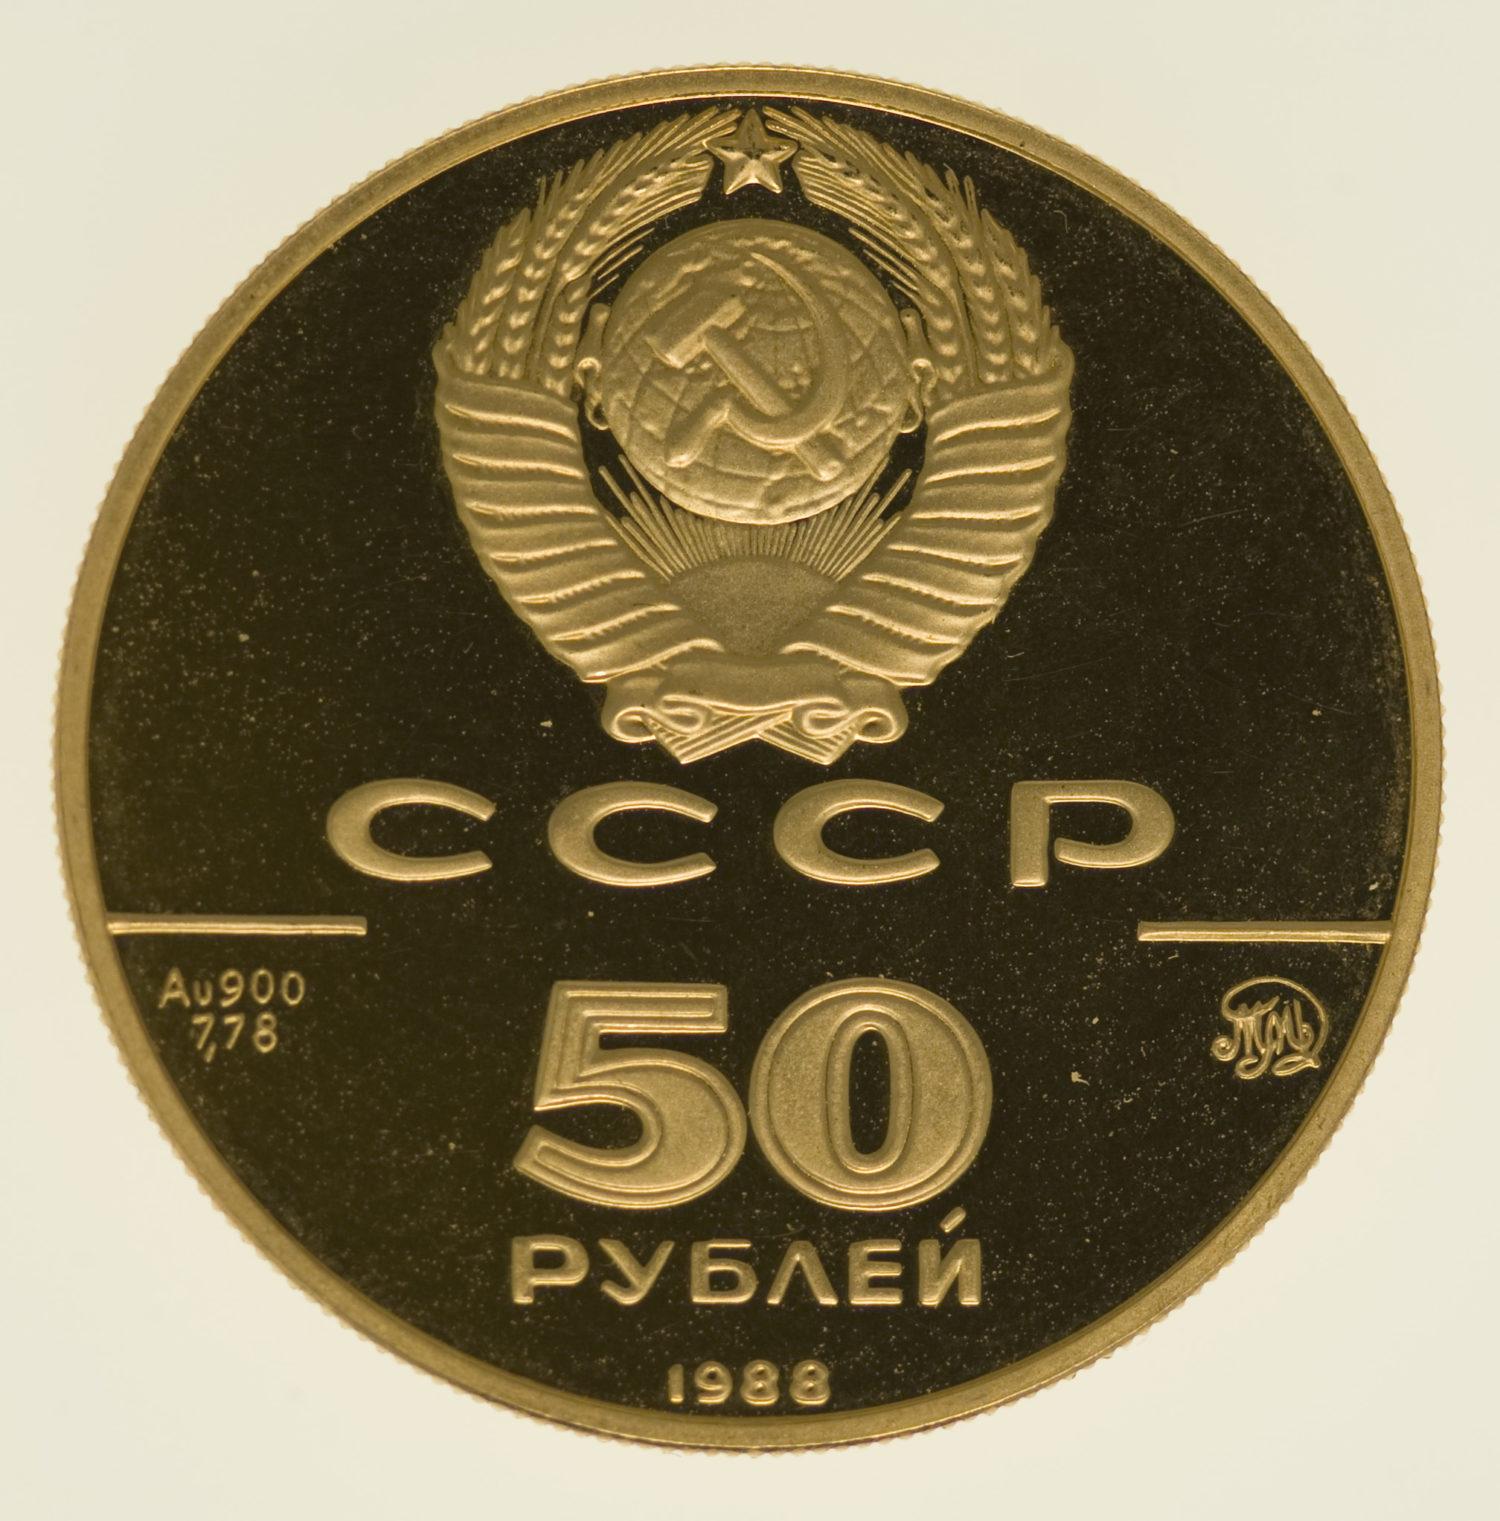 russland - Russland50 Rubel 1988